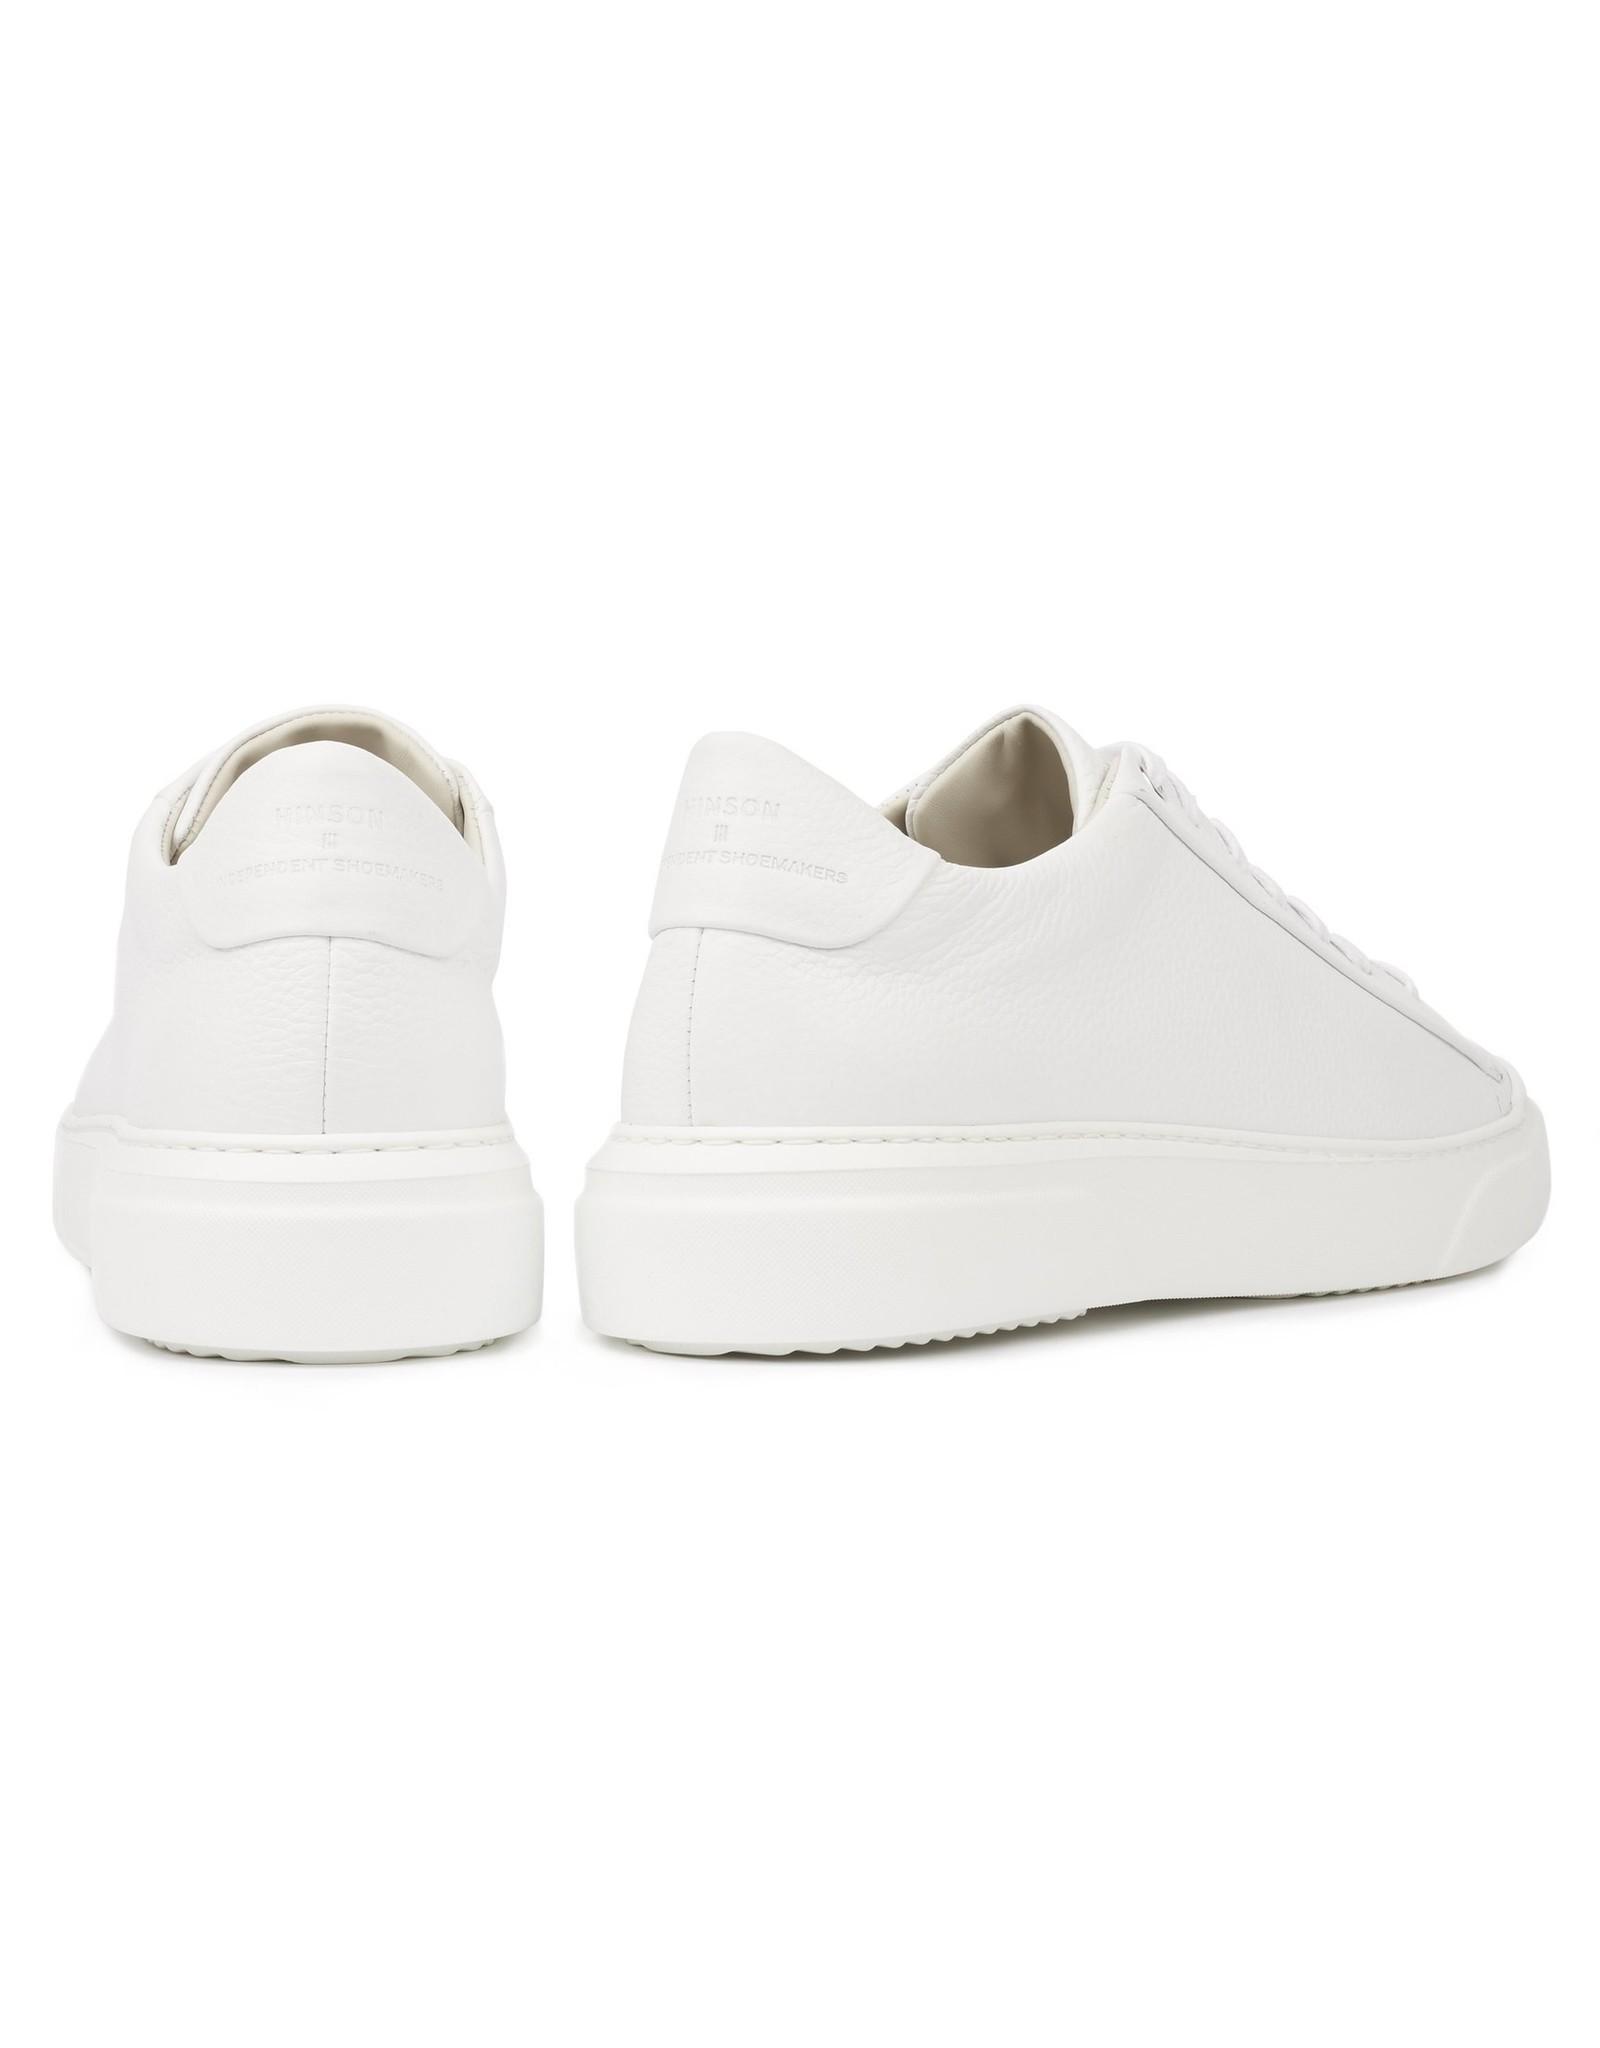 Hinson Sneaker leder wit-witte zool